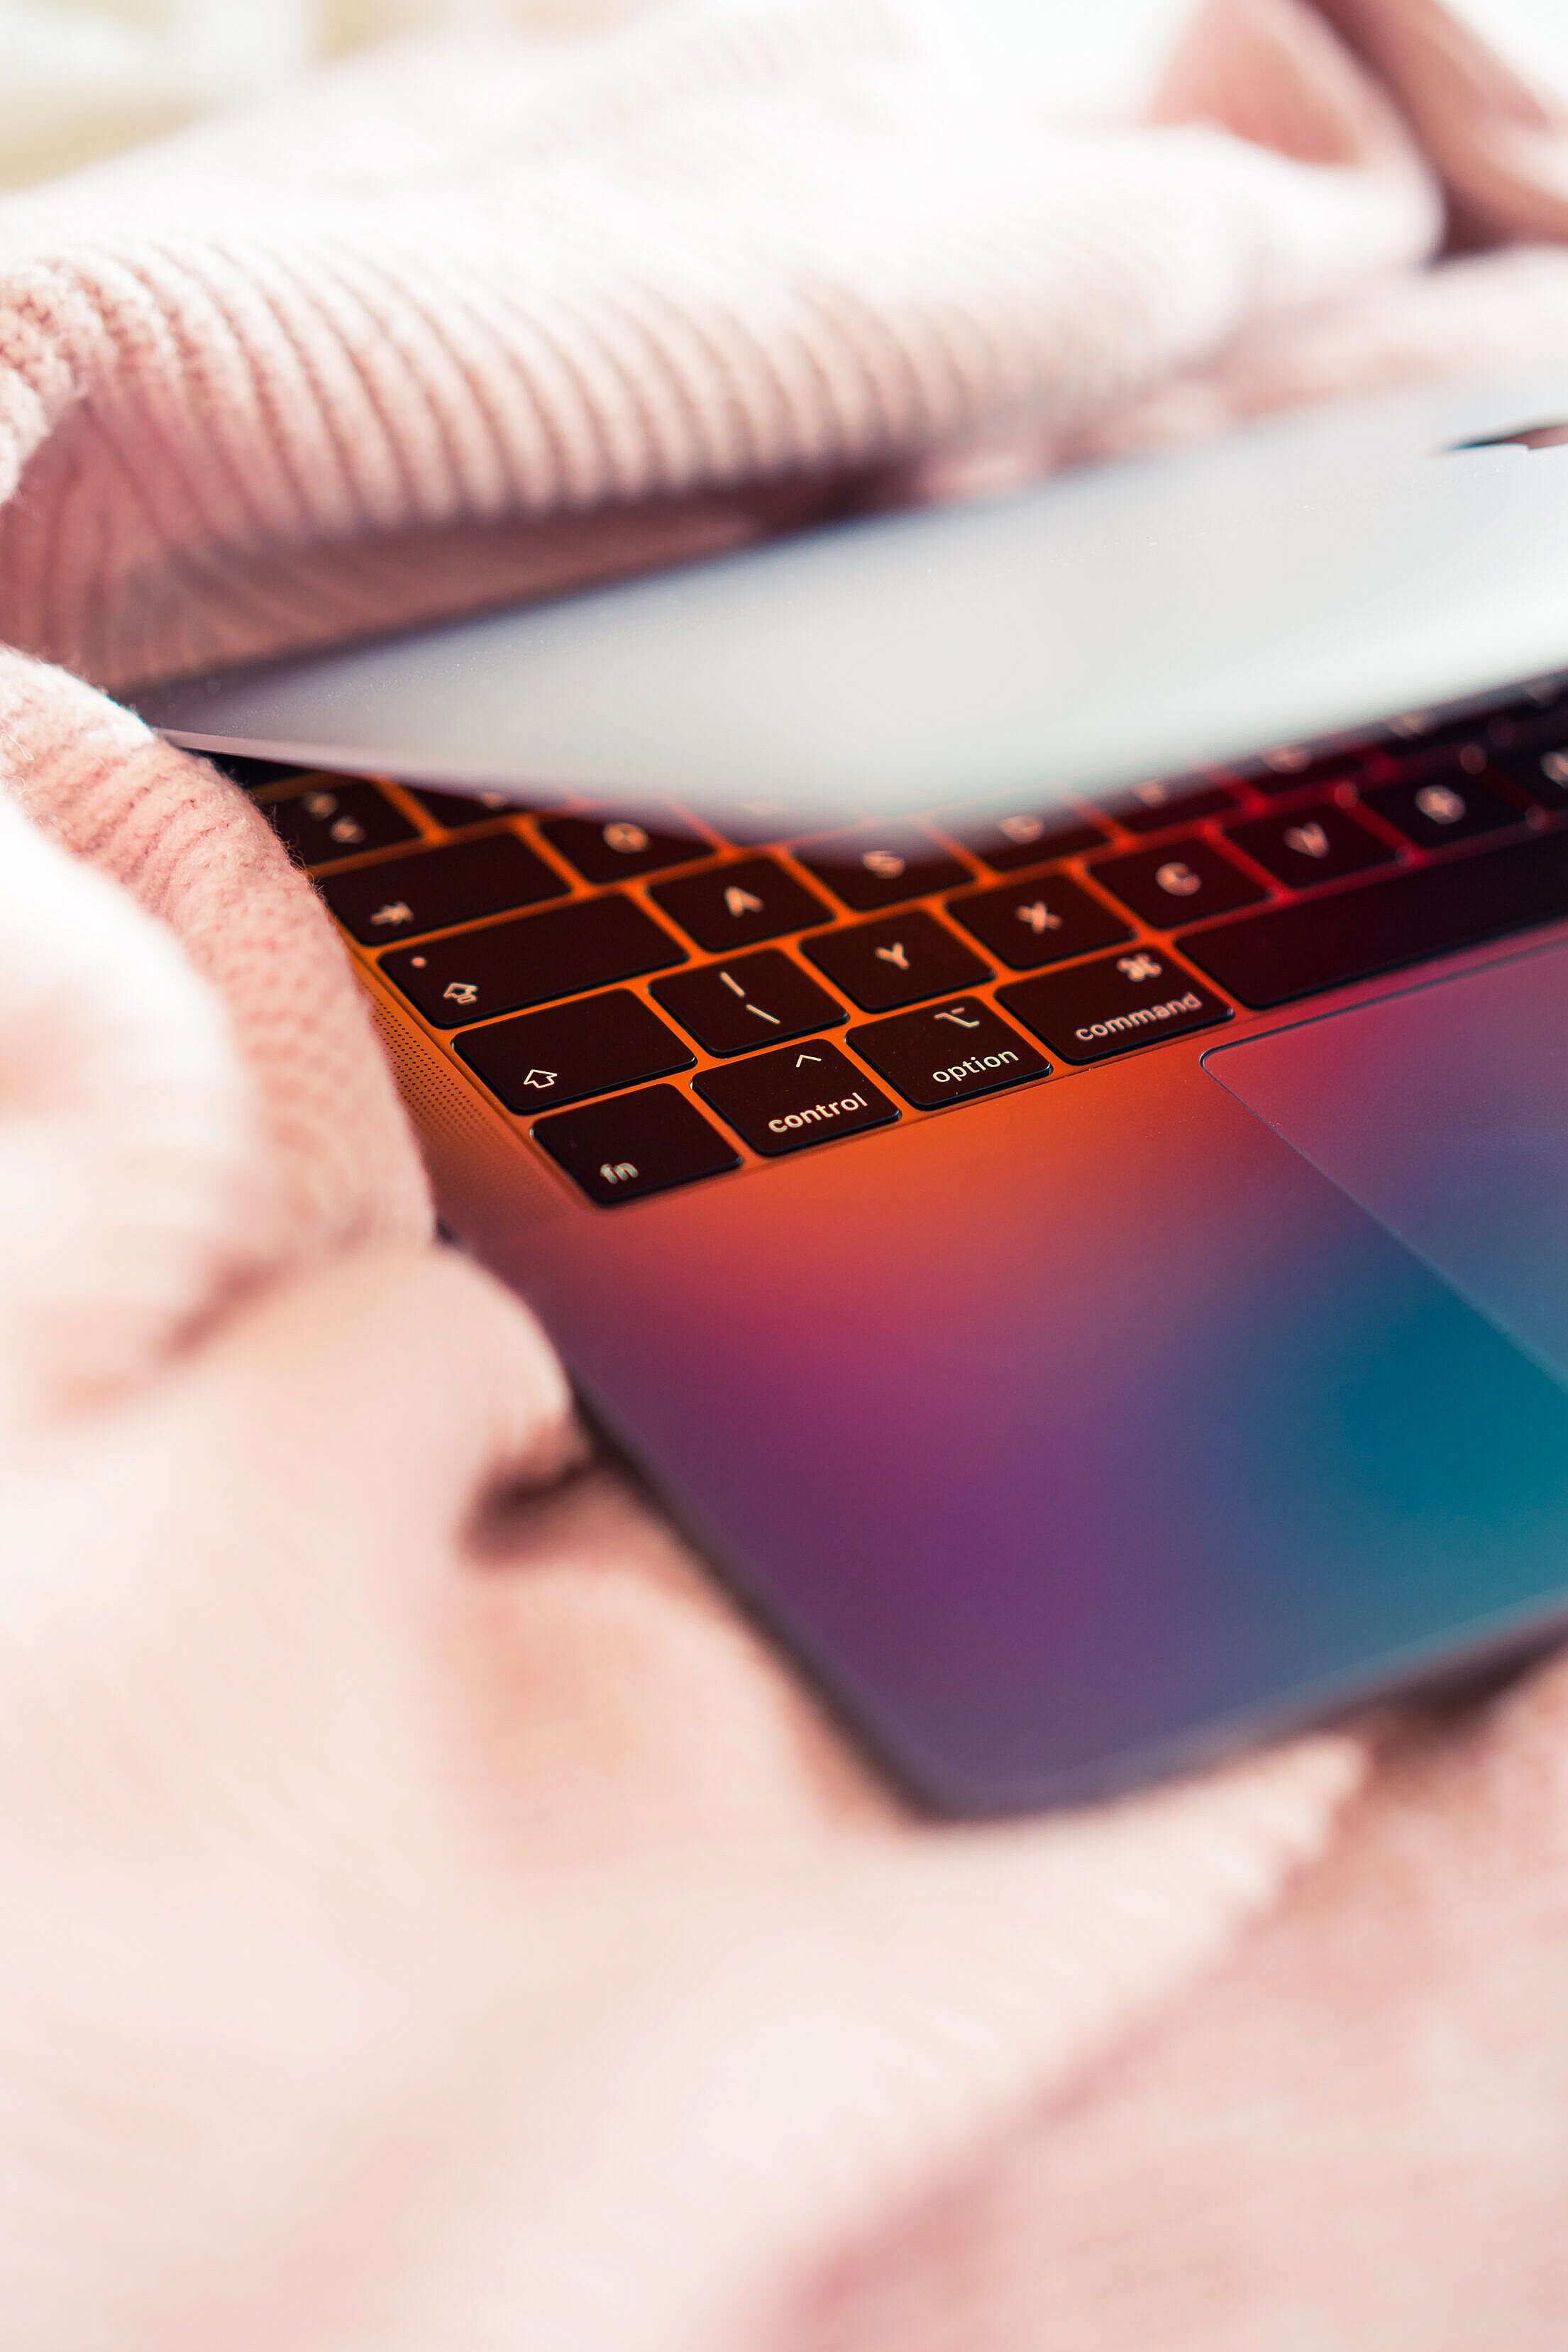 Modern Laptop in Women's Bed Free Stock Photo